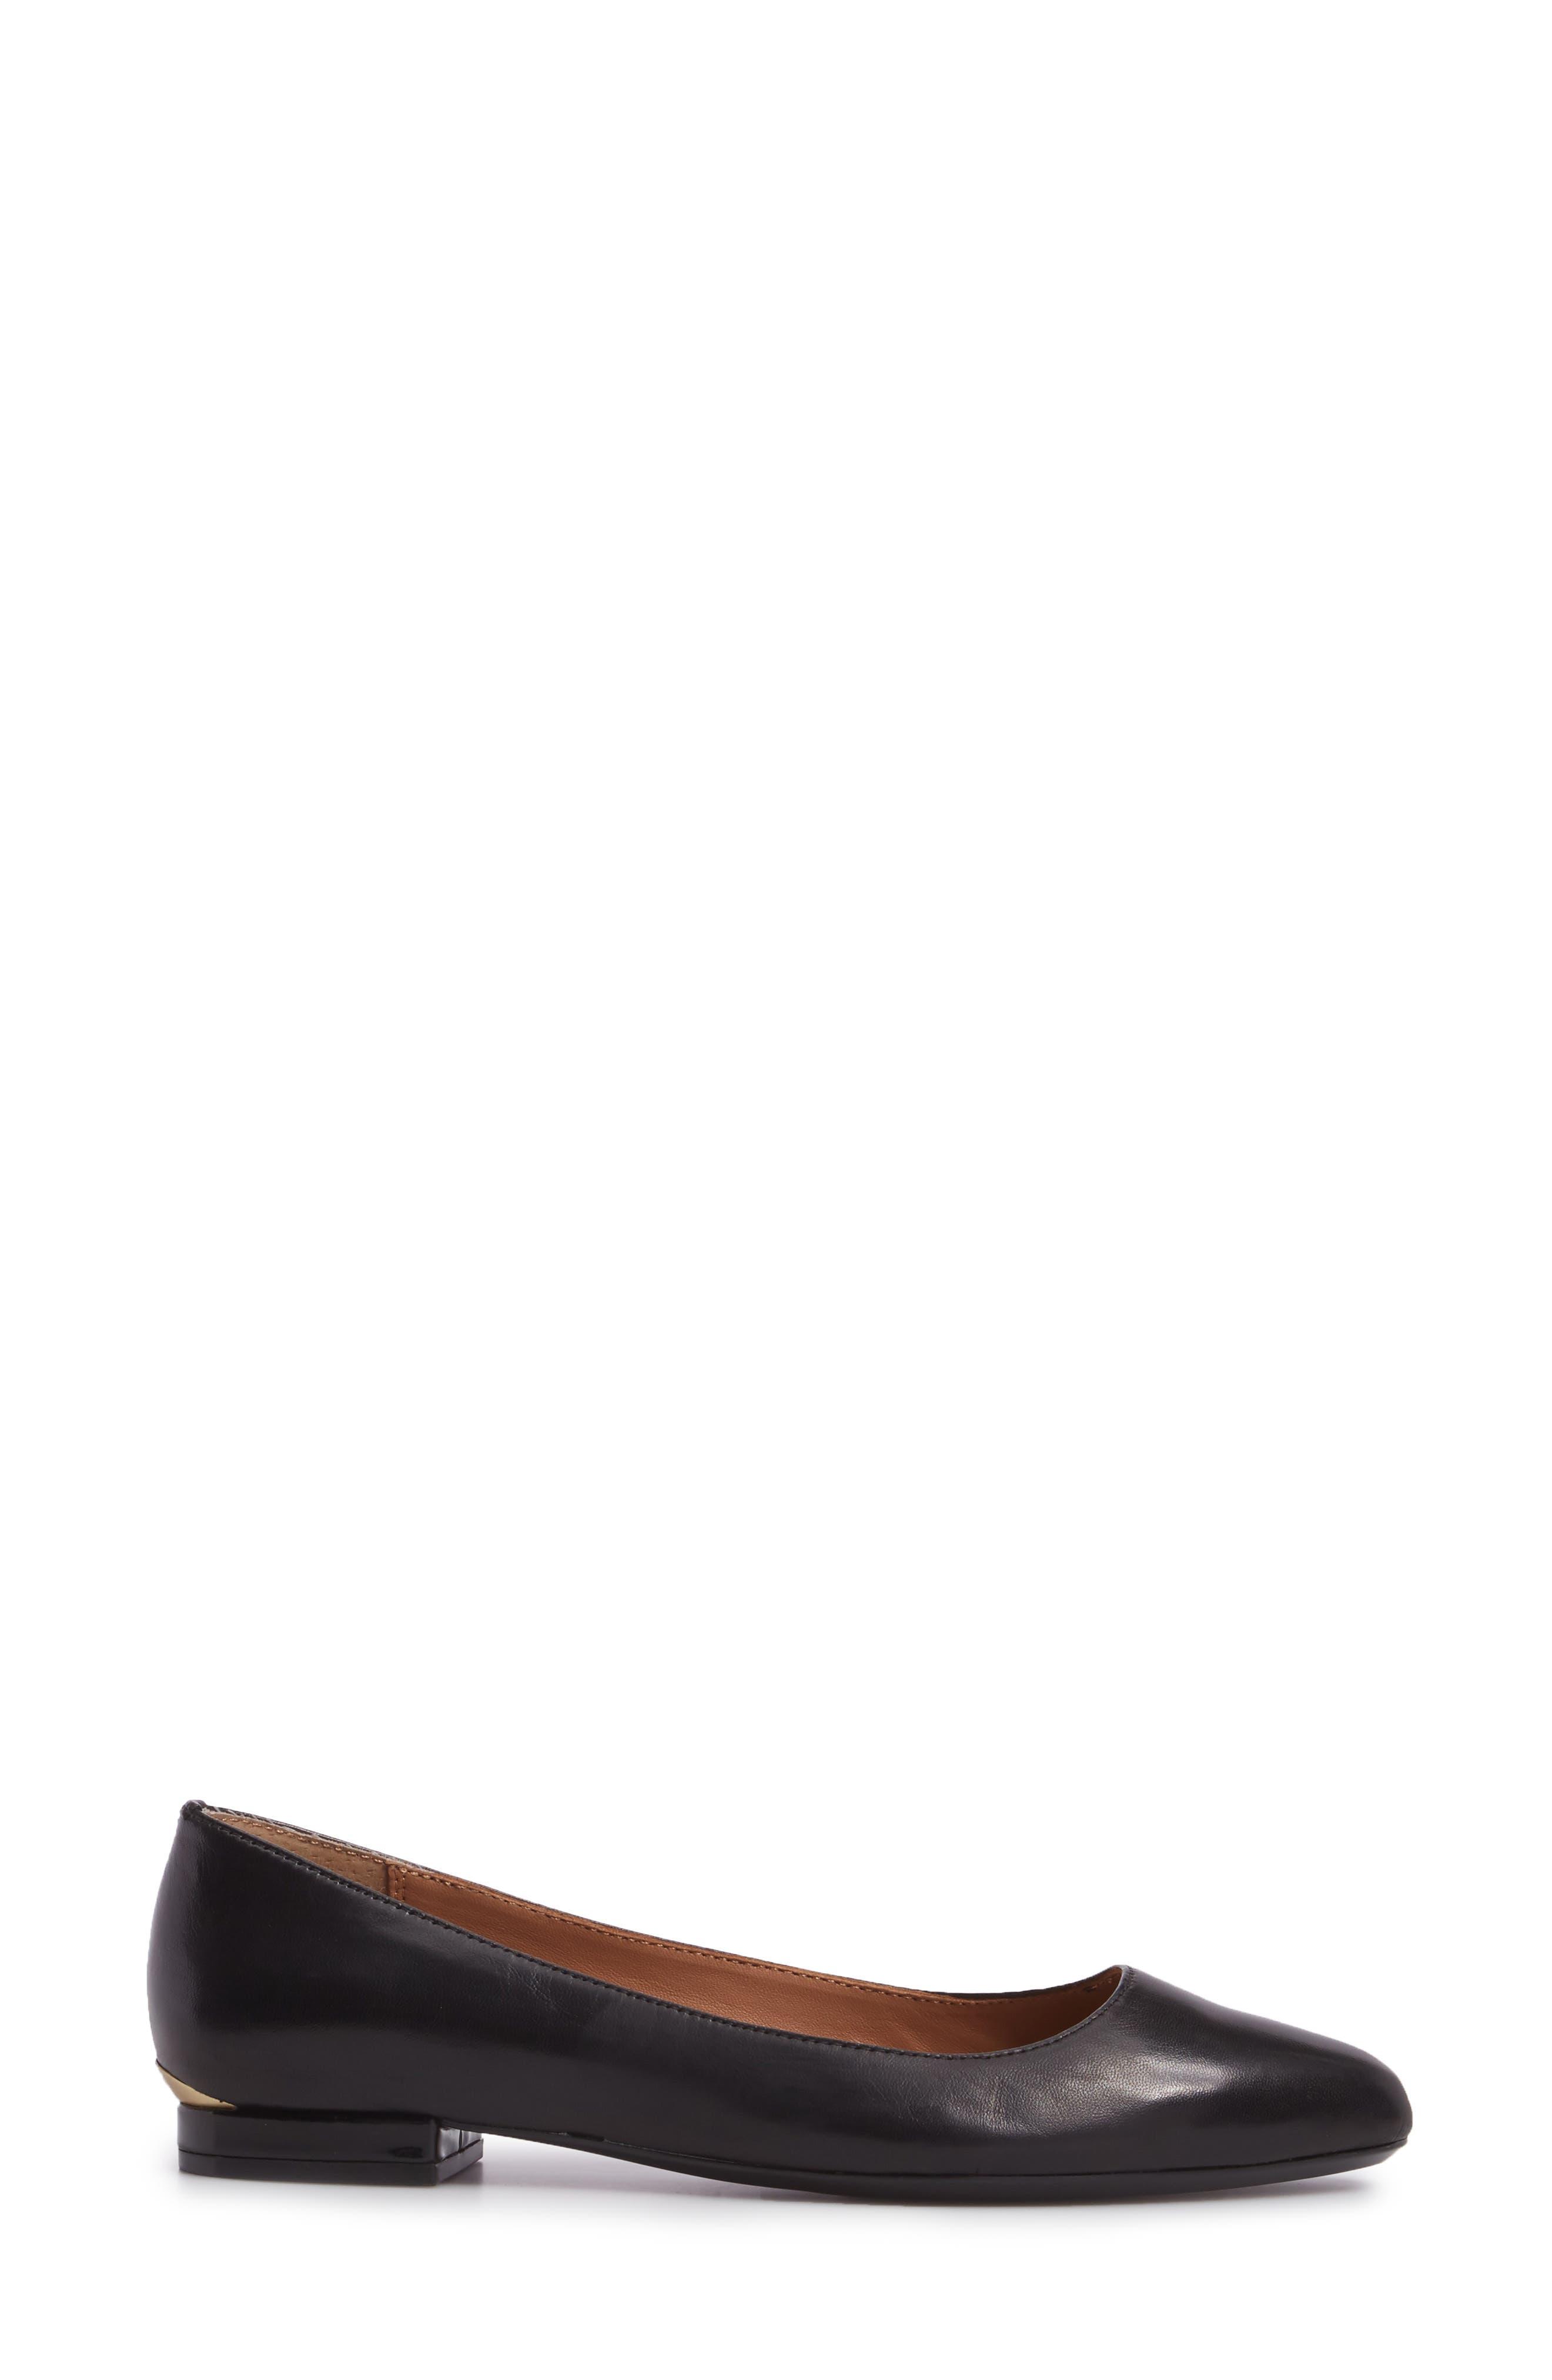 Gredel Flat,                             Alternate thumbnail 3, color,                             Black Leather